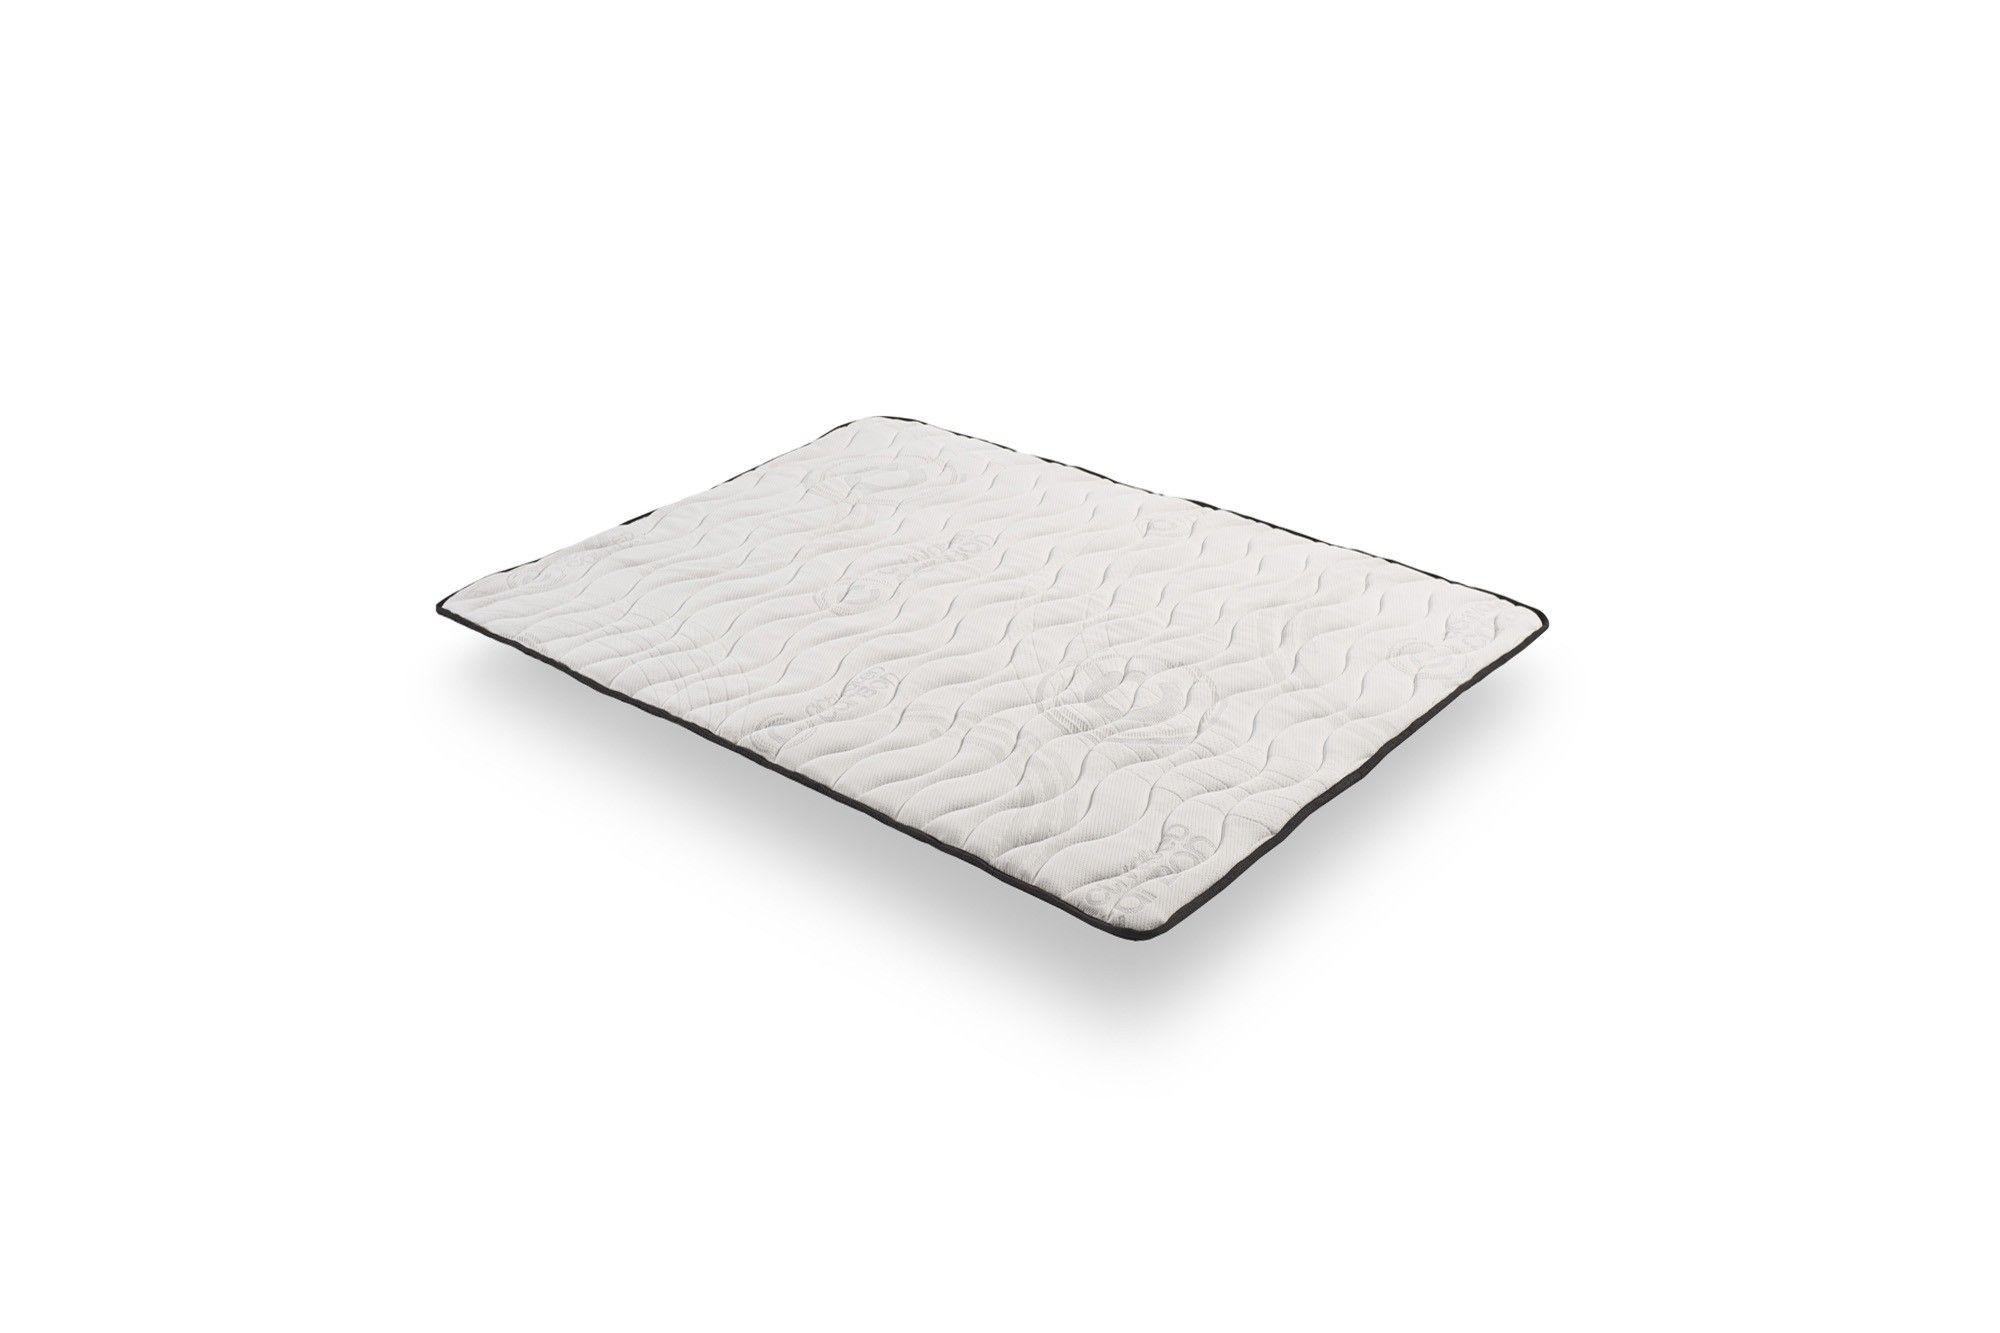 Memory Foam Topper «Carbon» | Látex natural | Tecnologia Antistress Cosmos Bedding